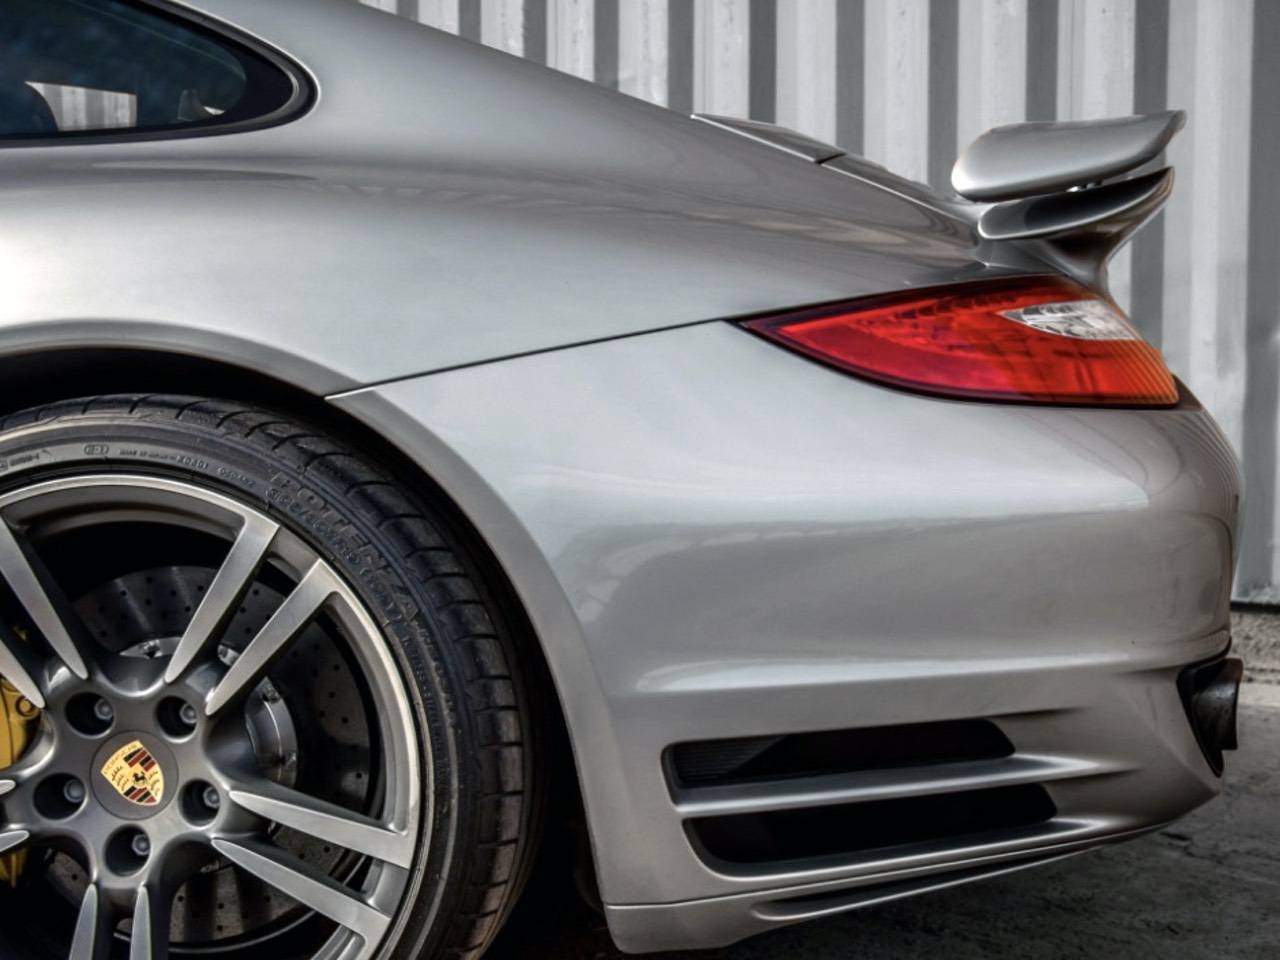 Porsche-911-Turbo-S-MKII-4